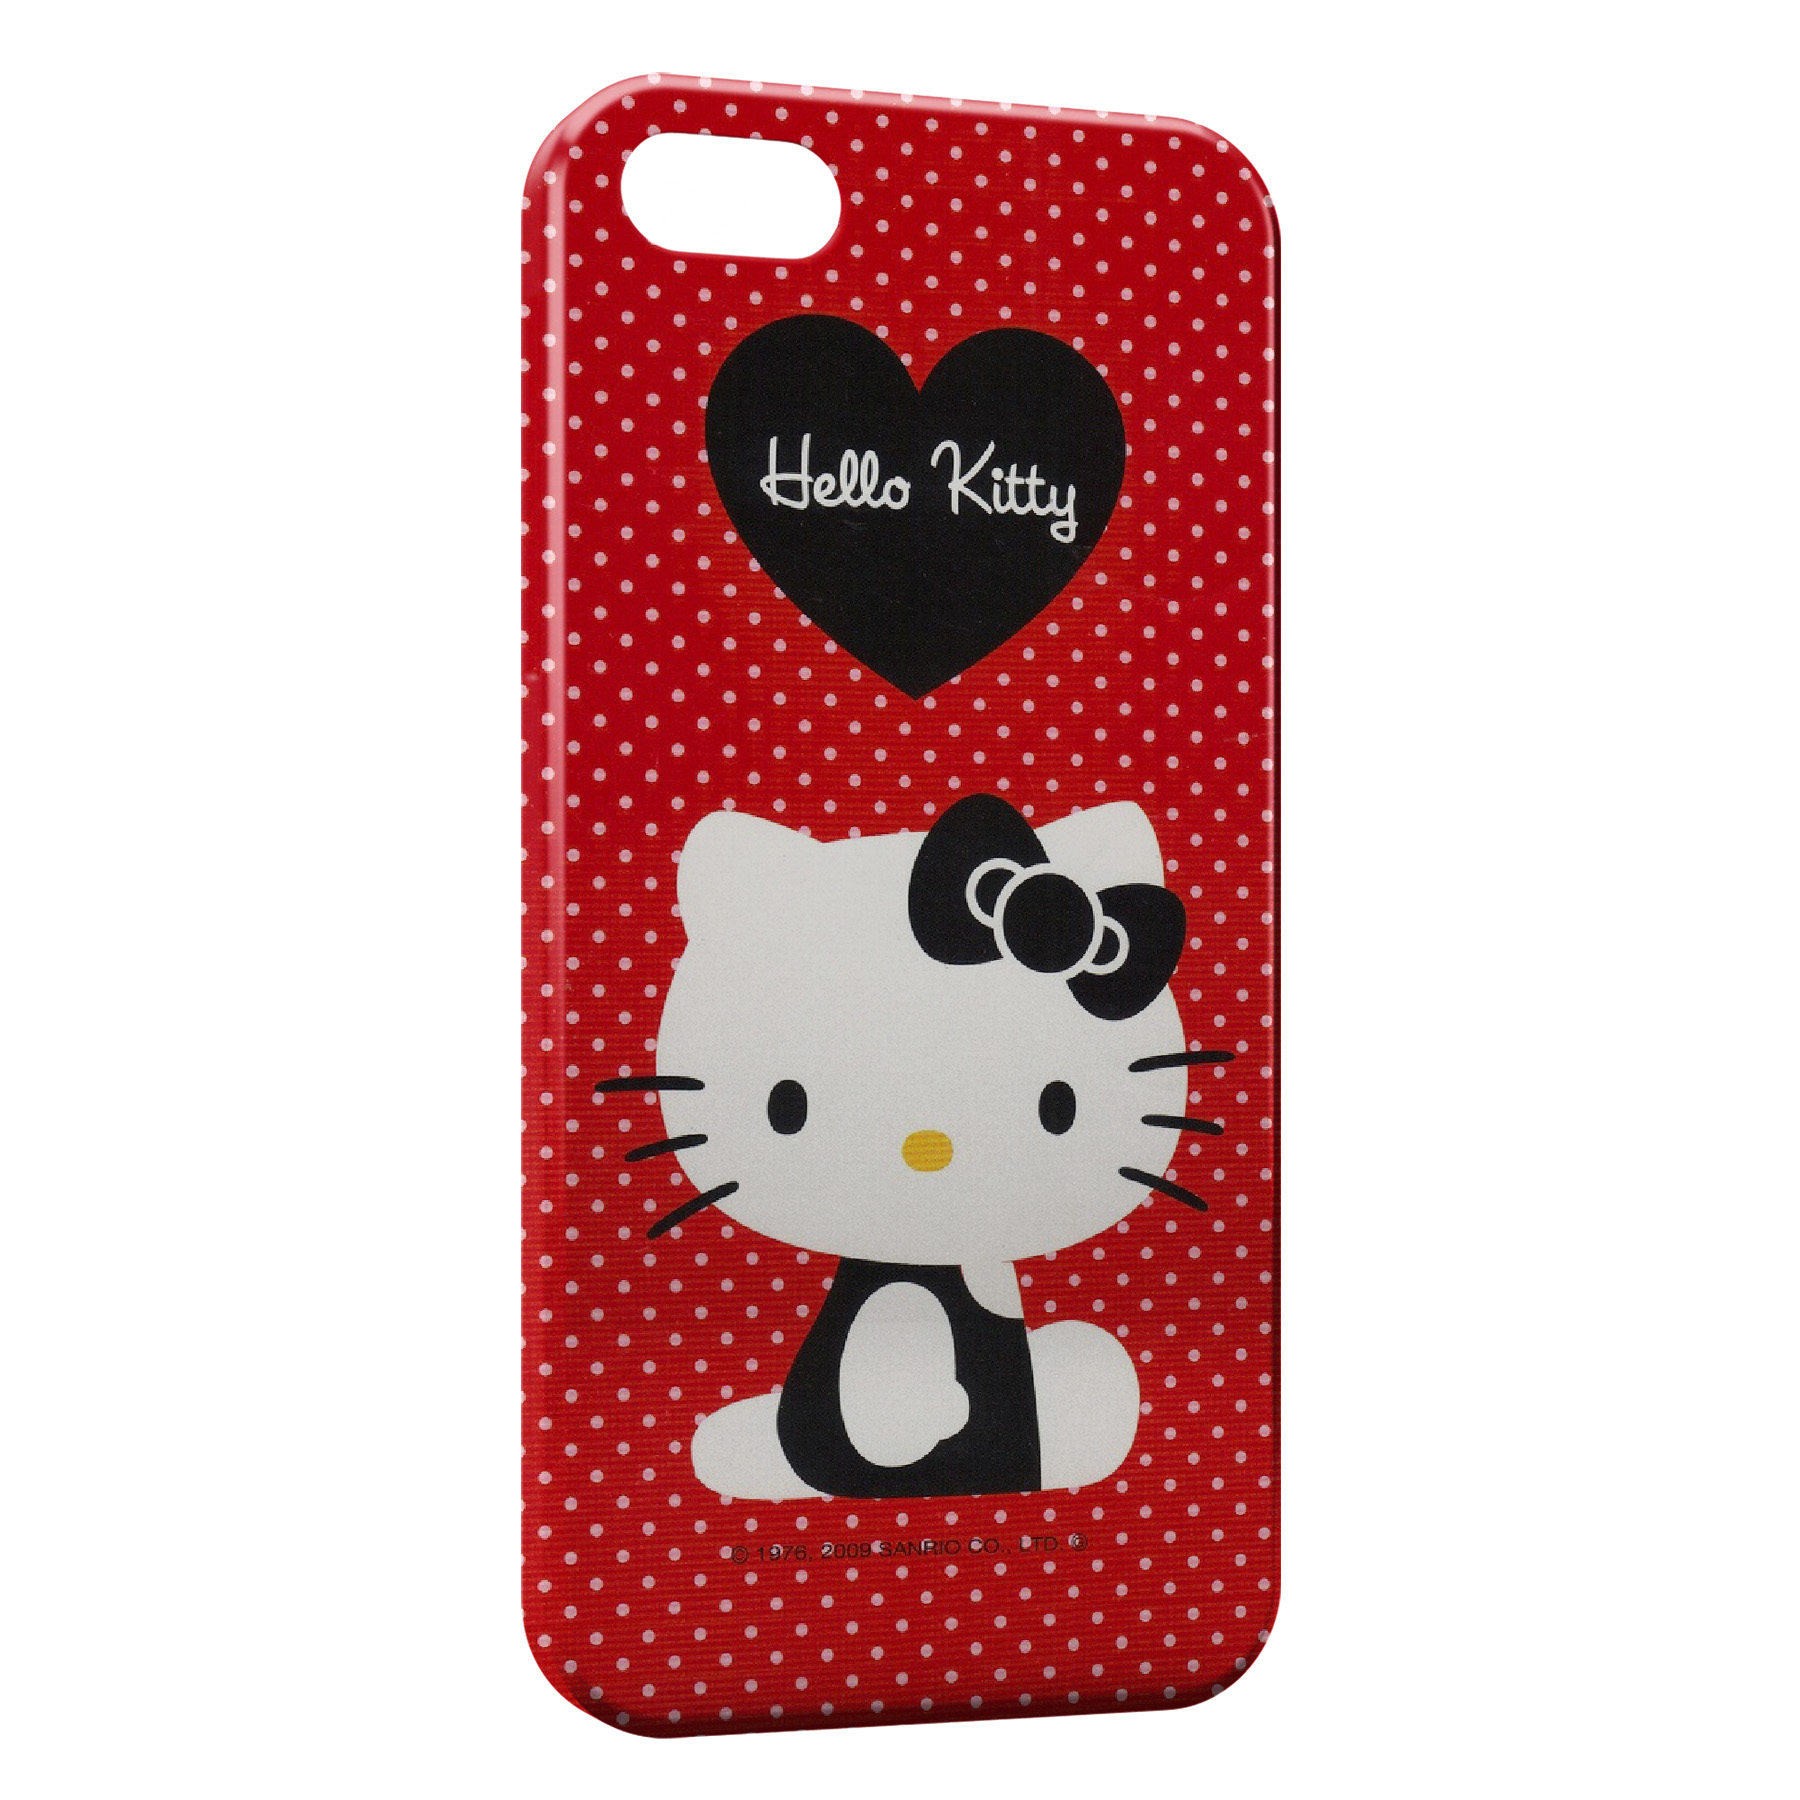 hello kitty coque iphone 6